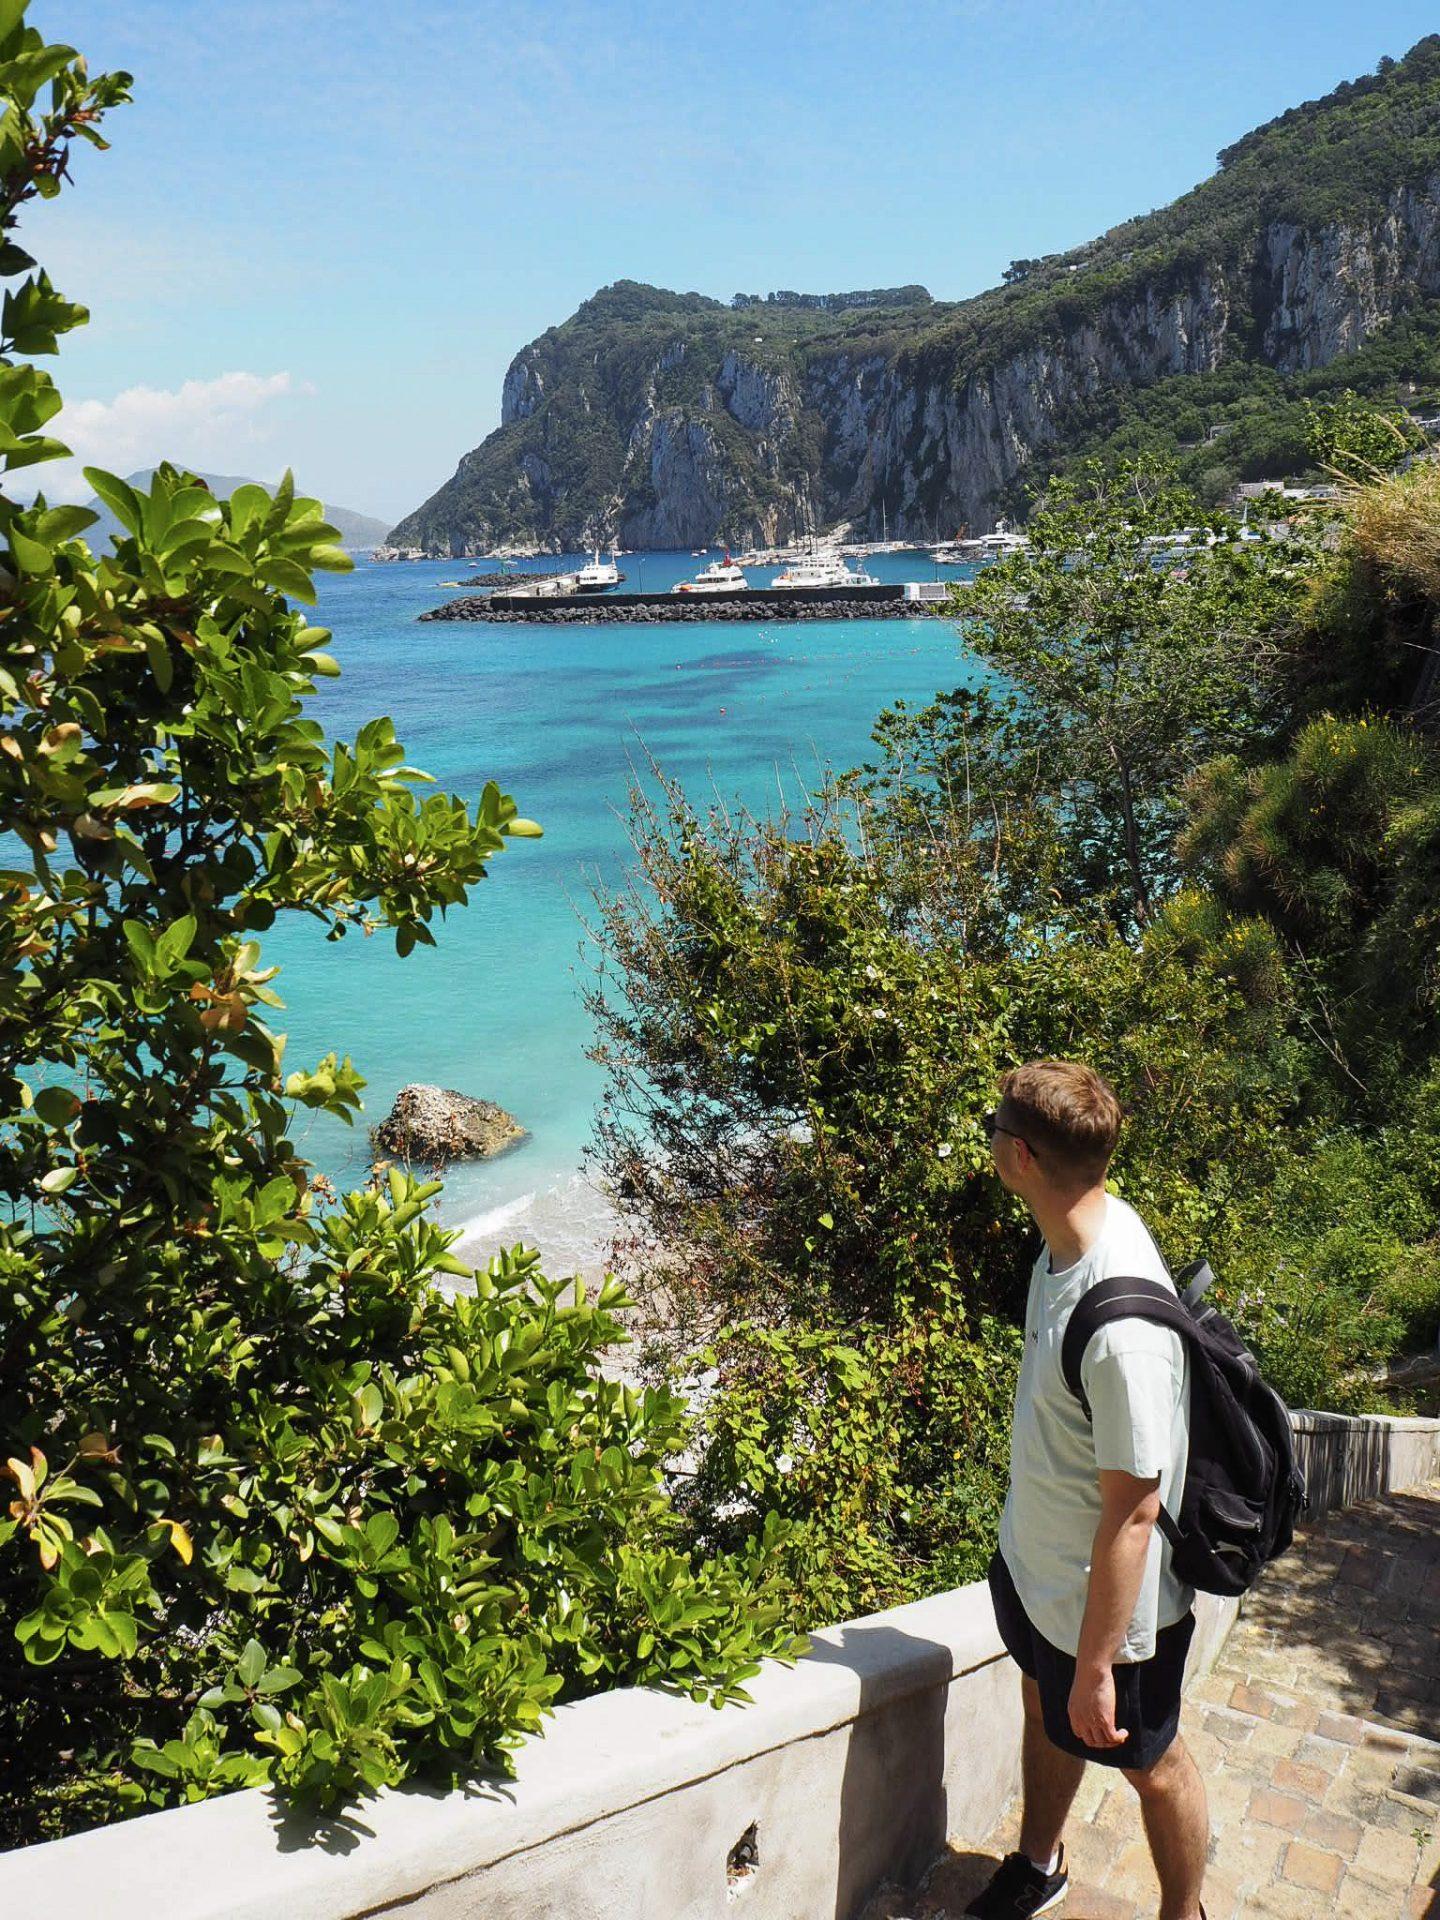 Sorrento travel: Capri island